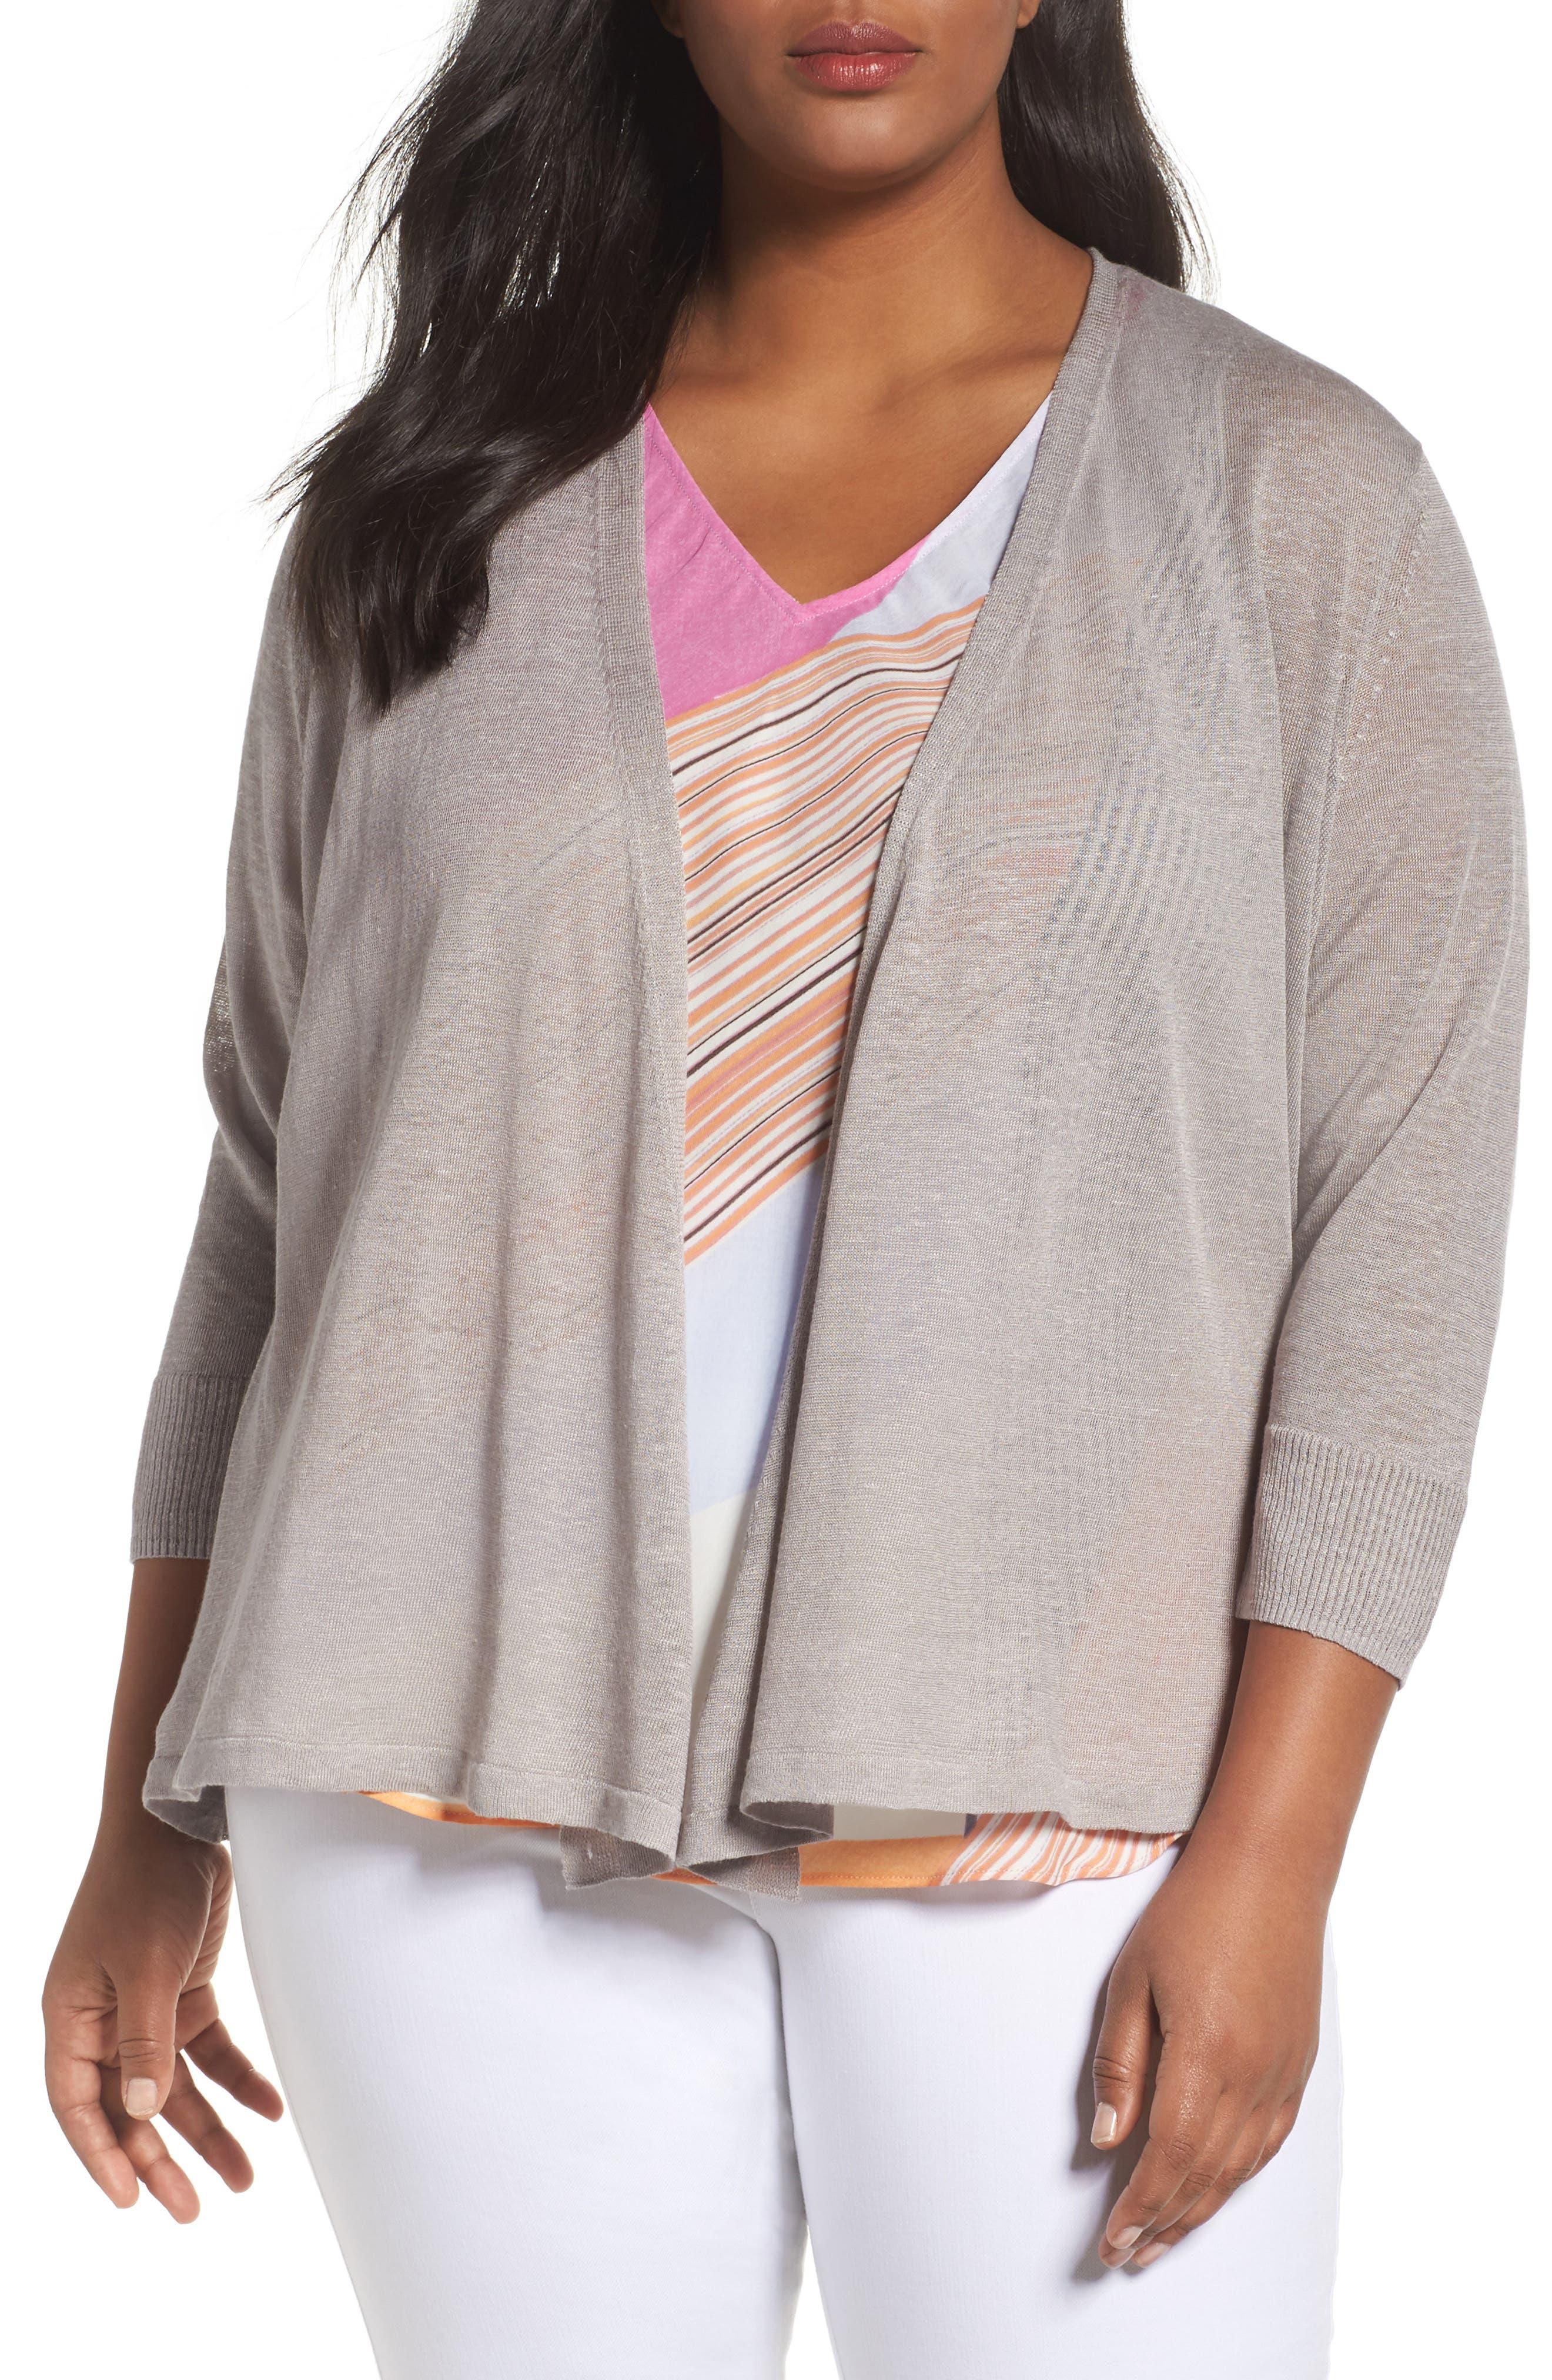 Main Image - NIC+ZOE '4-Way' Three Quarter Sleeve Convertible Cardigan (Plus Size)